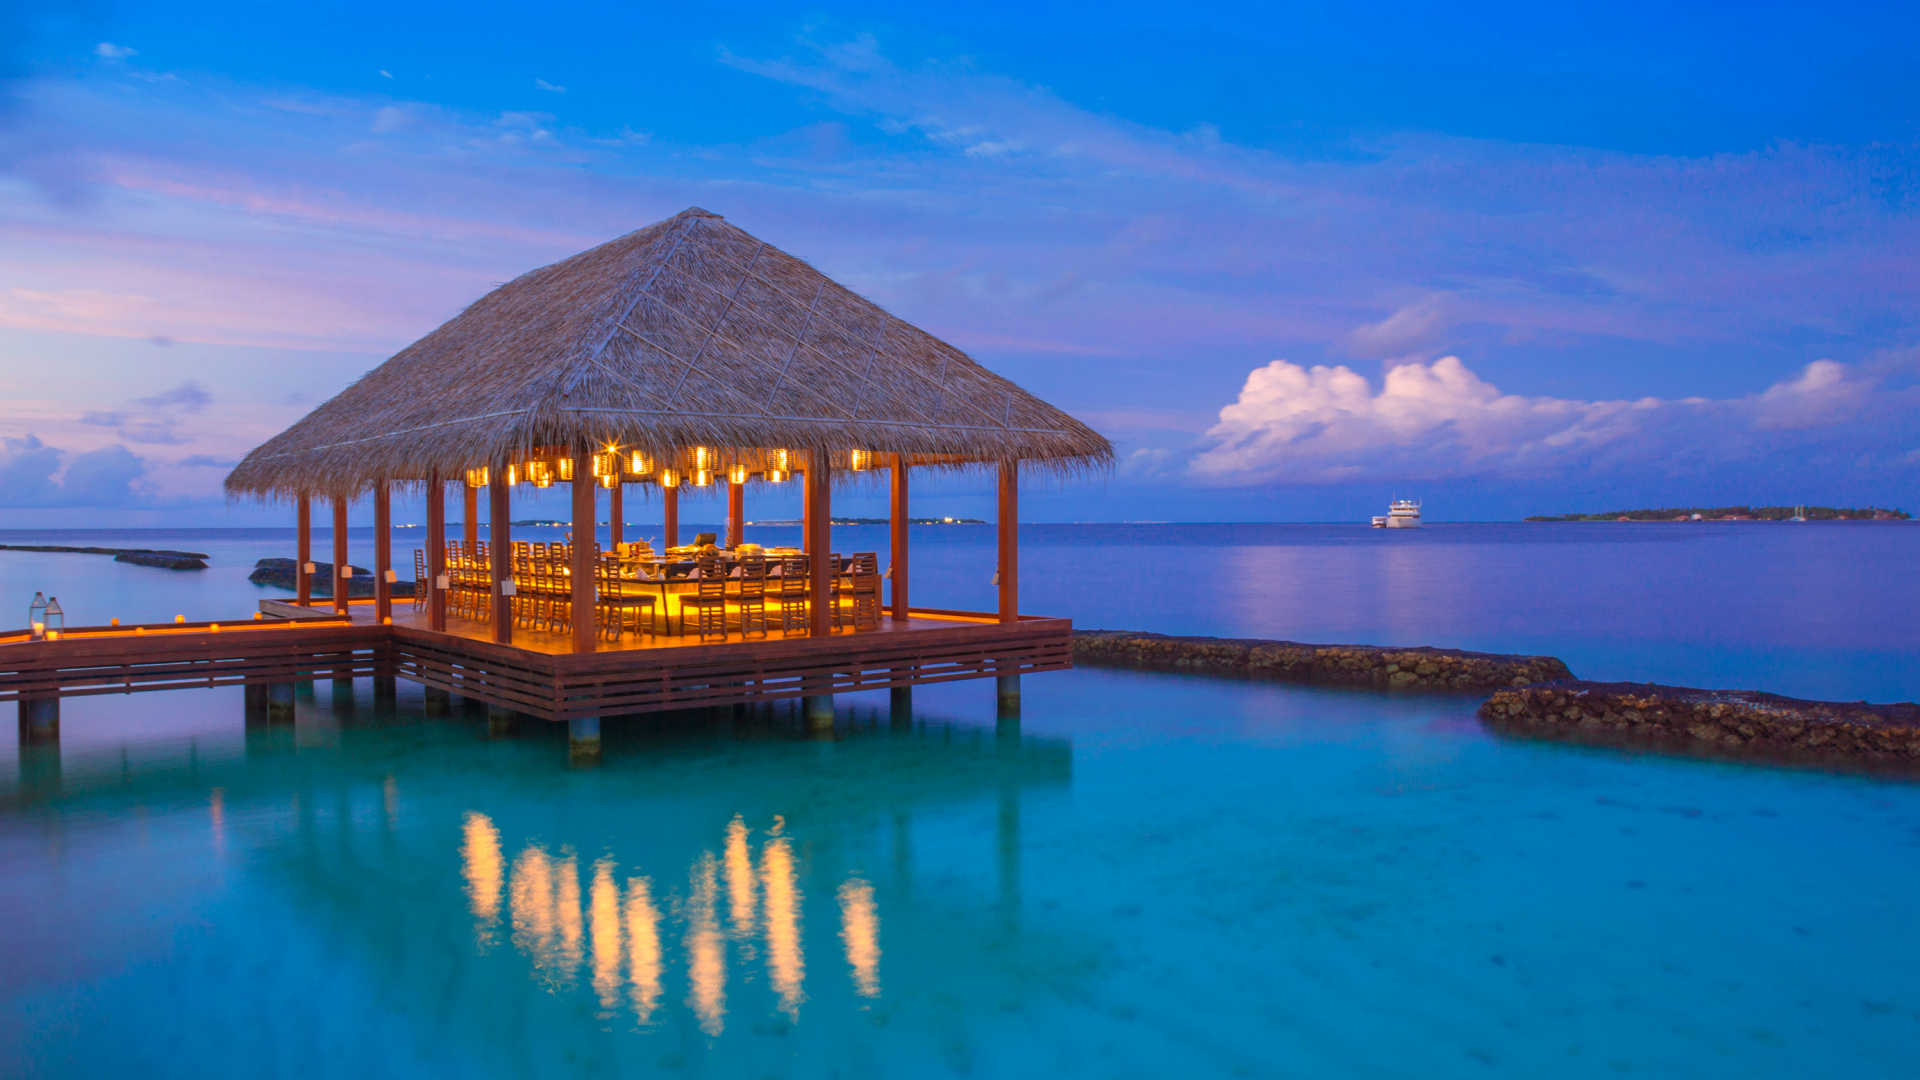 kurumba-maldives-40437717-1493823611-ImageGalleryLightboxLarge.jpg